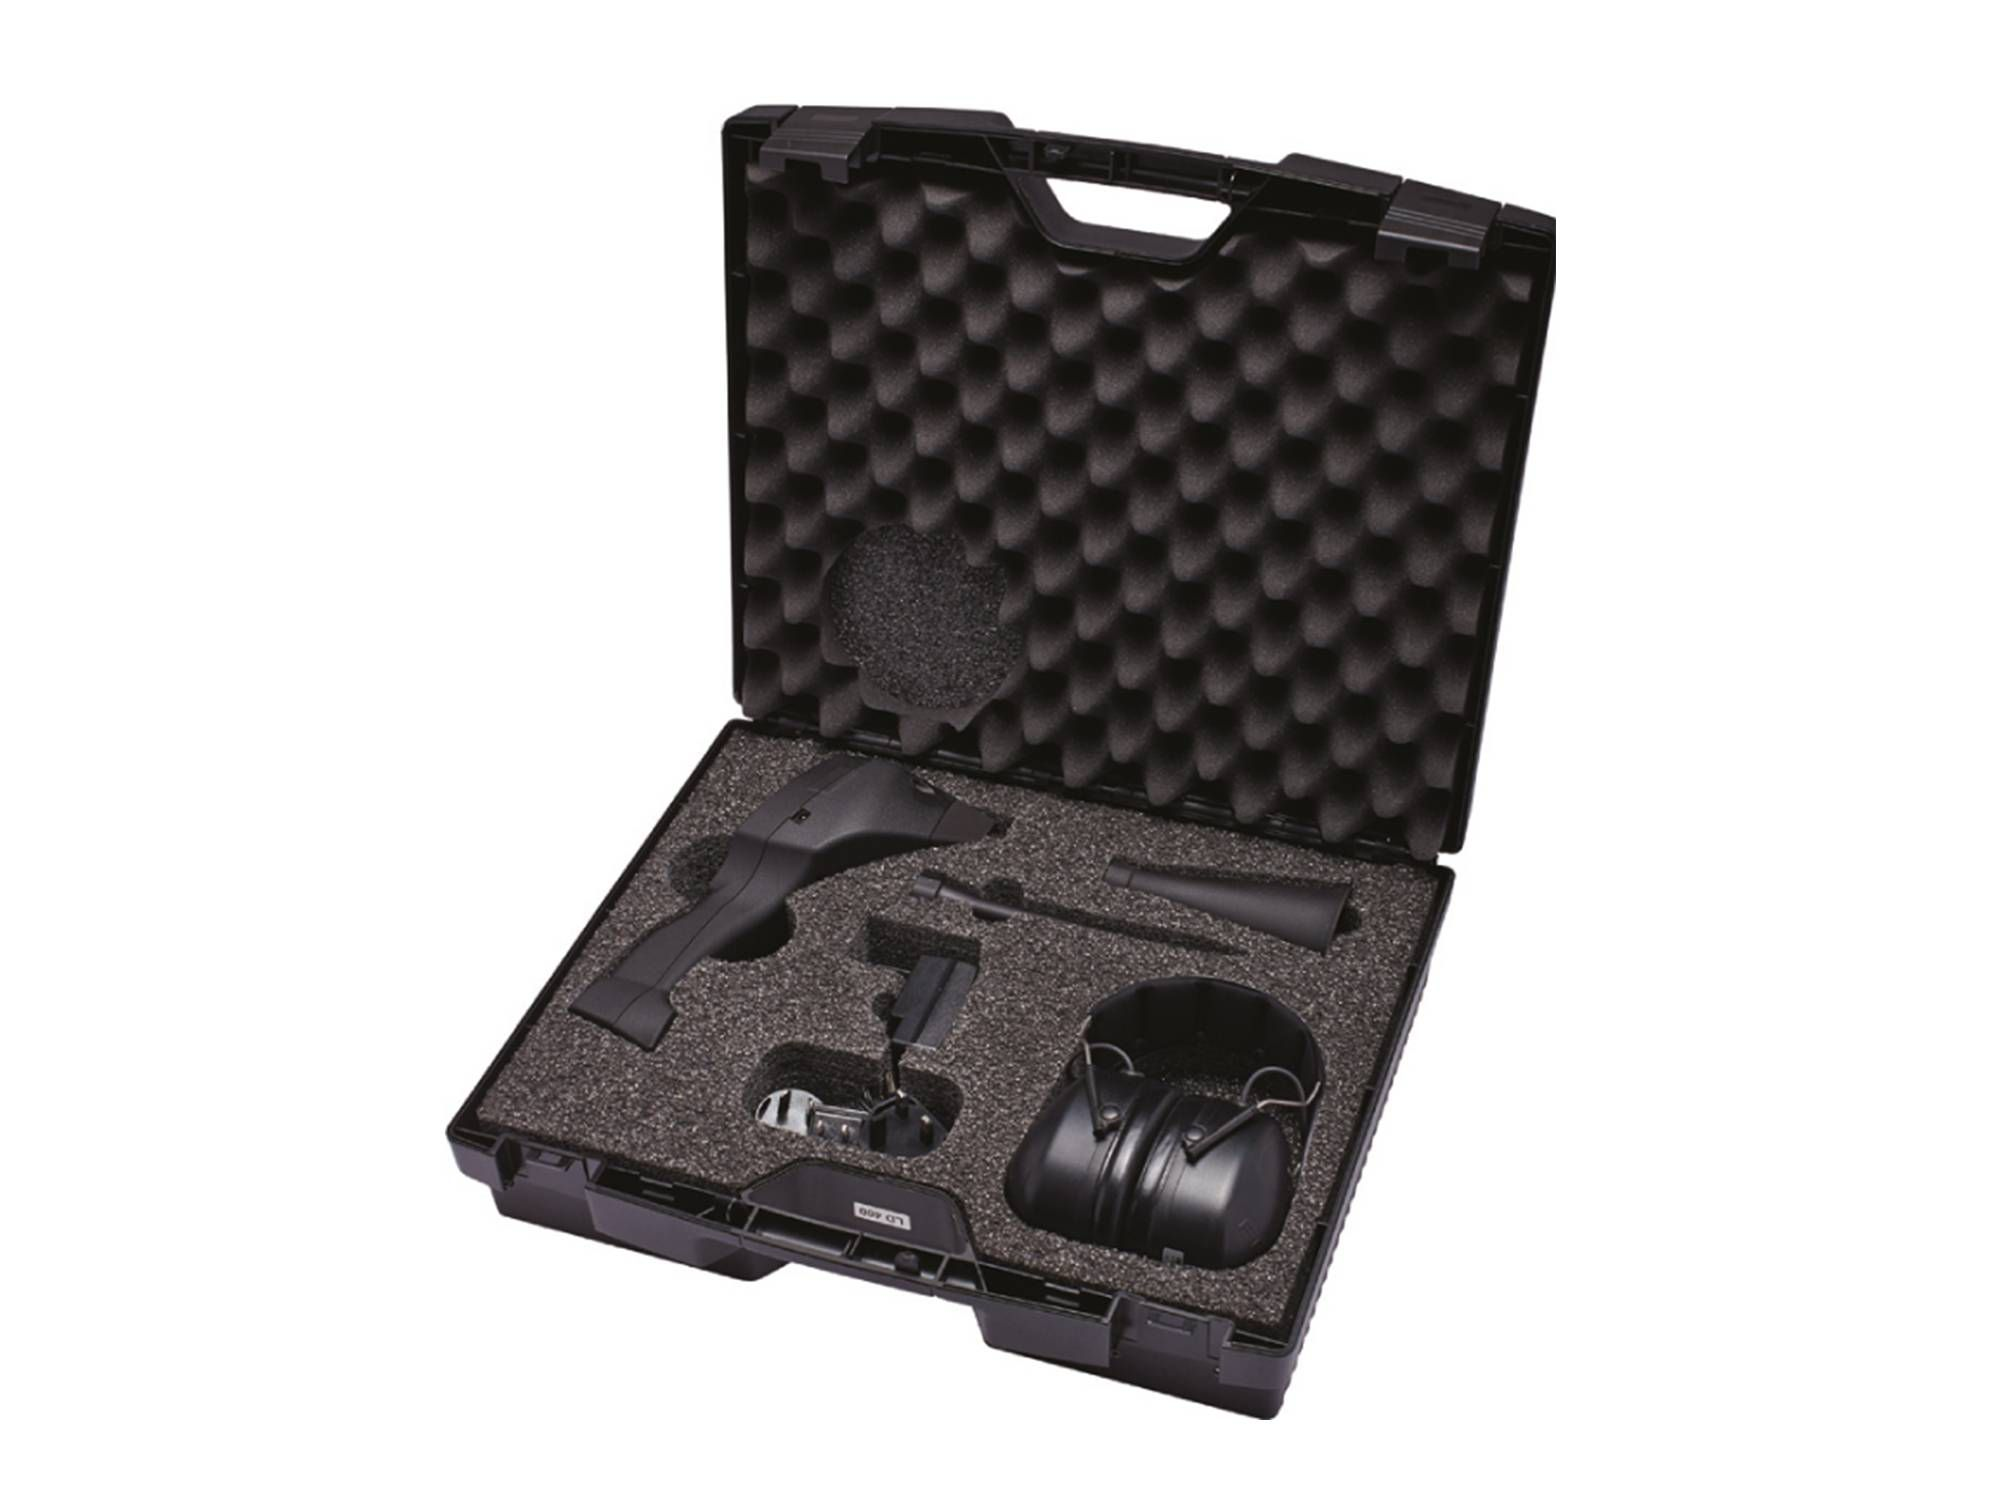 testo Sensor LD pro mit Koffer